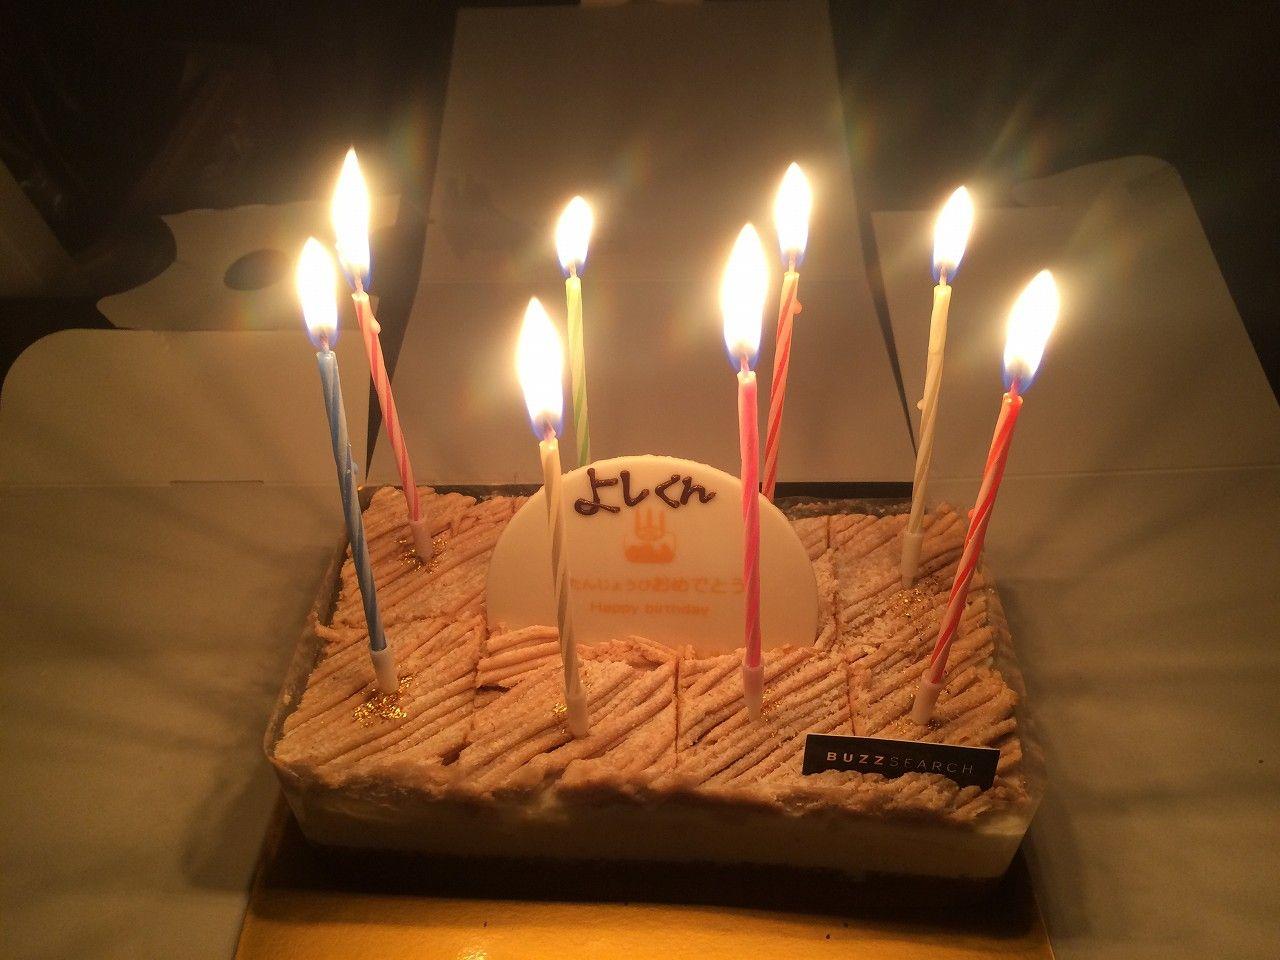 23 Yoshi君誕生日会 4